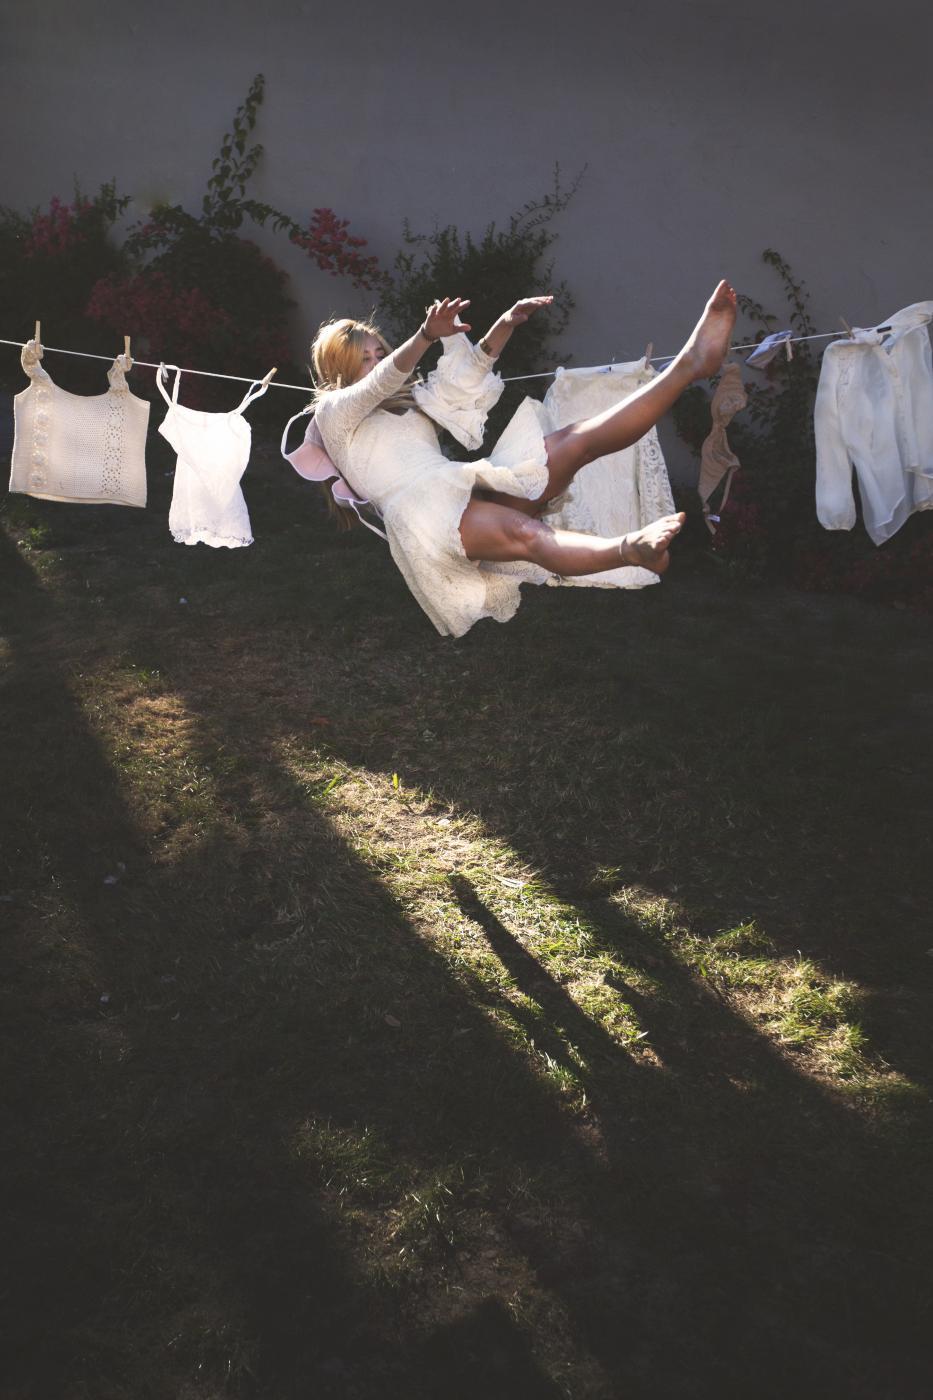 Jordan_clothesline_022